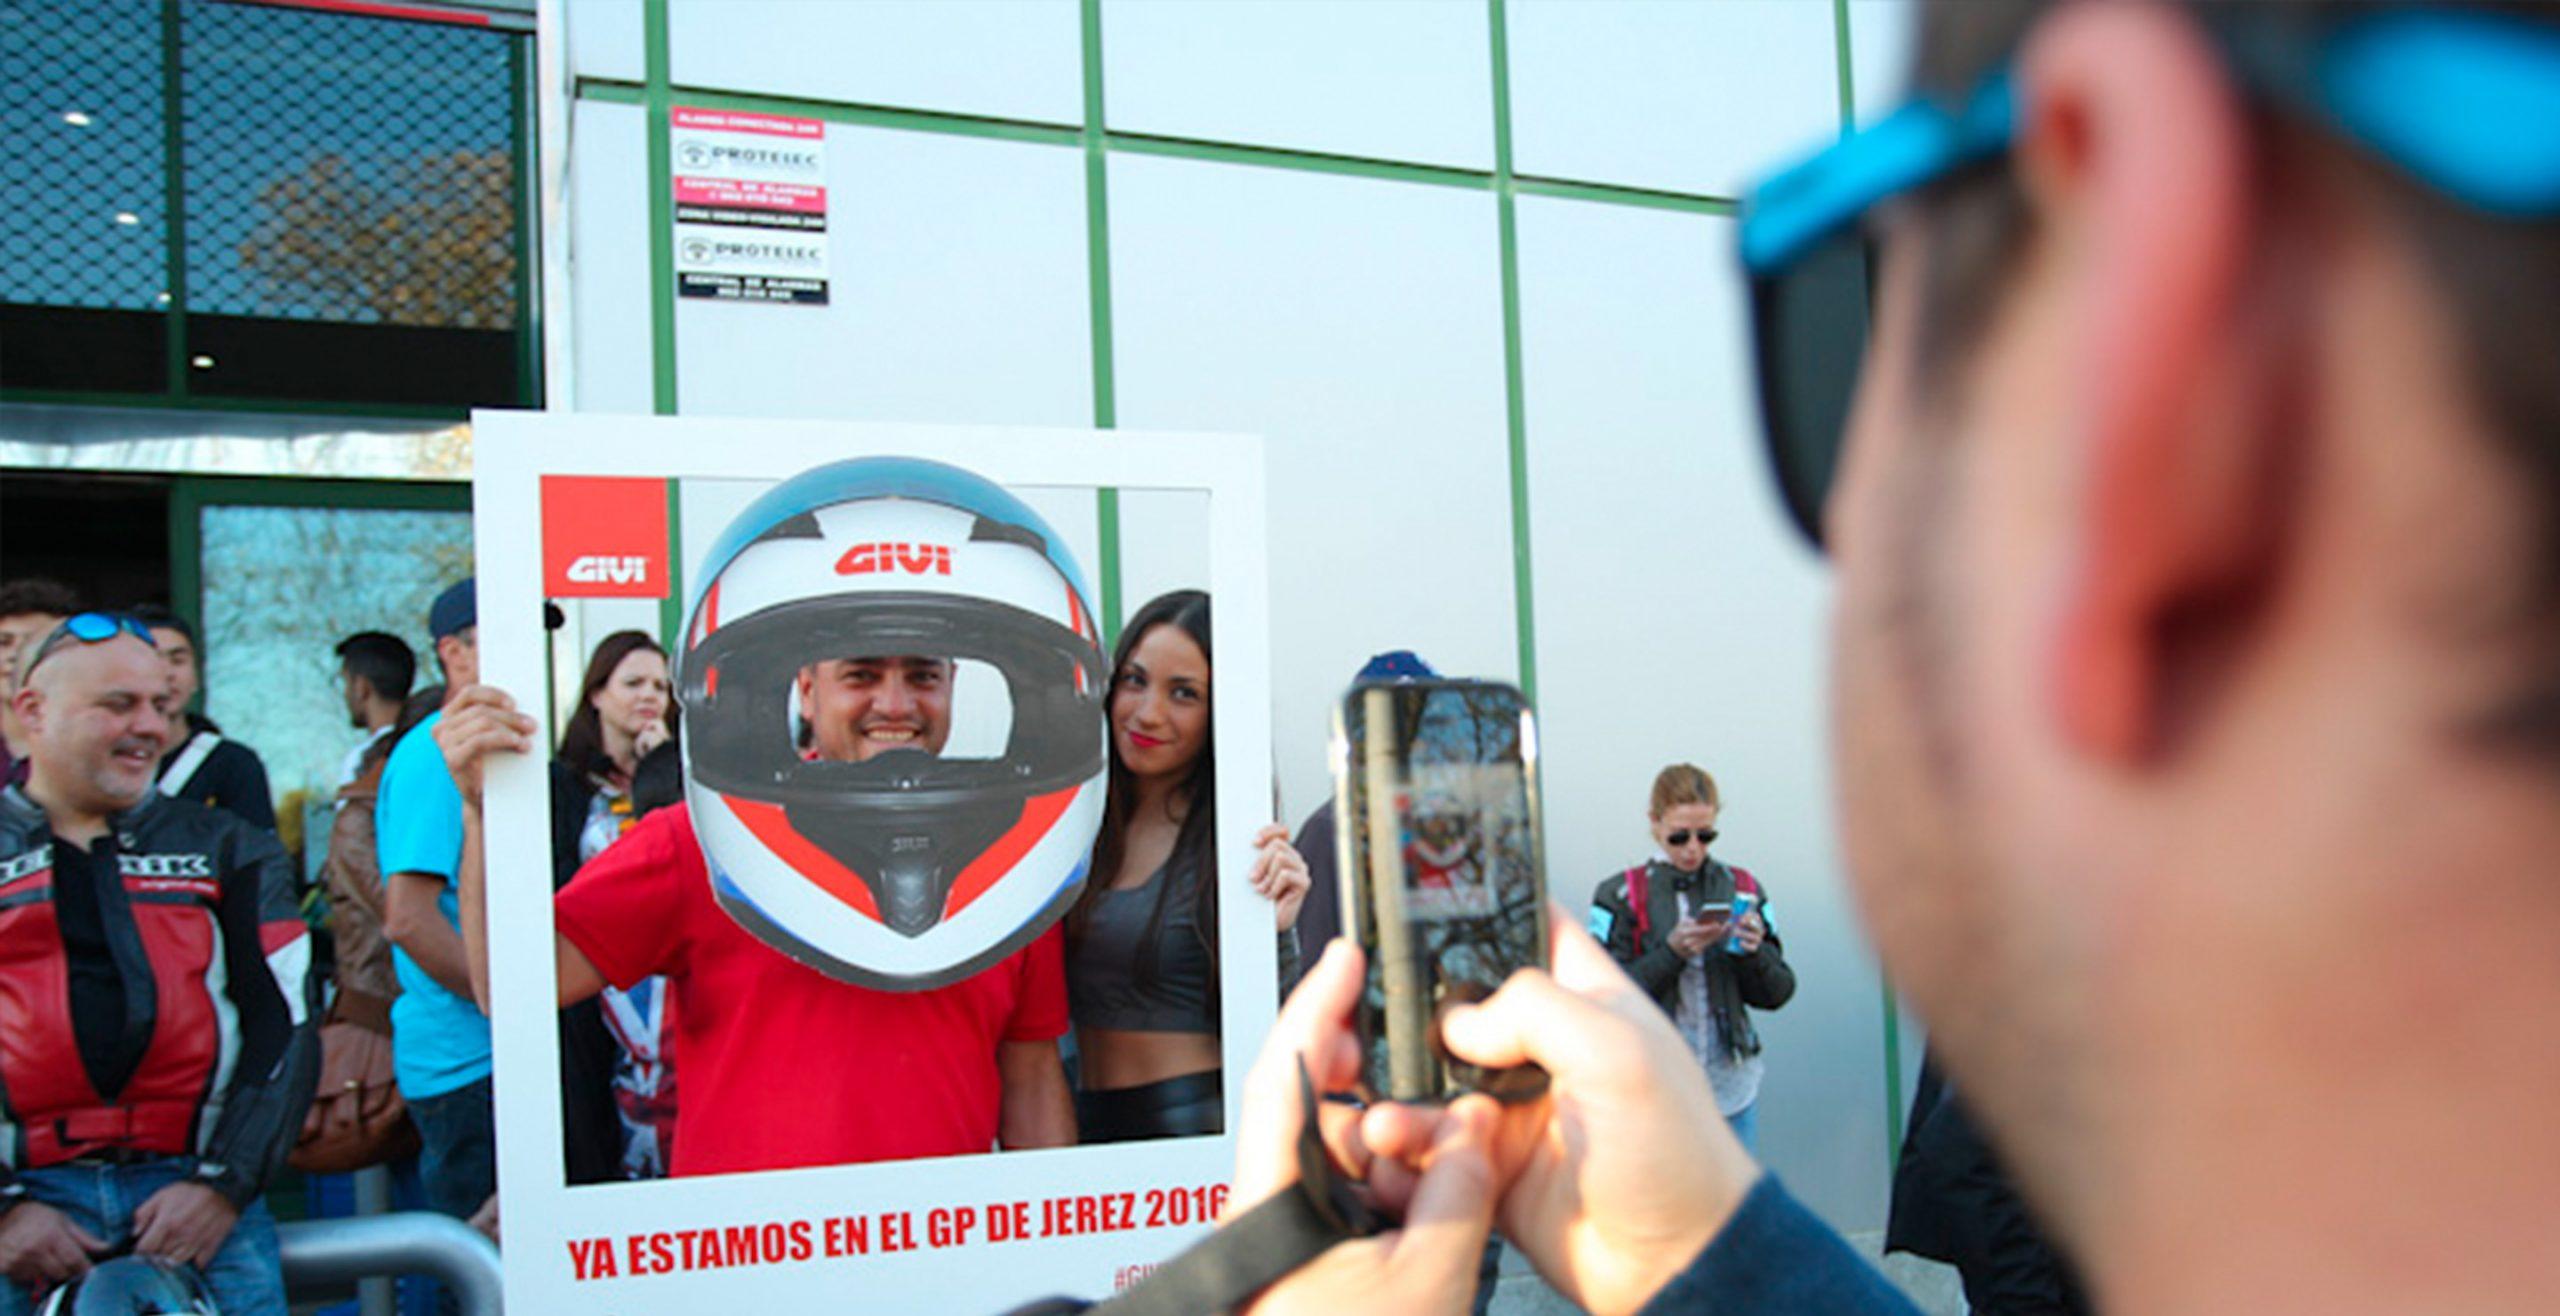 Casco gigante GIVI para accón de marketing de guerrilla durante la celebración del Gran Premio de Motociclismo de Jerez 2014